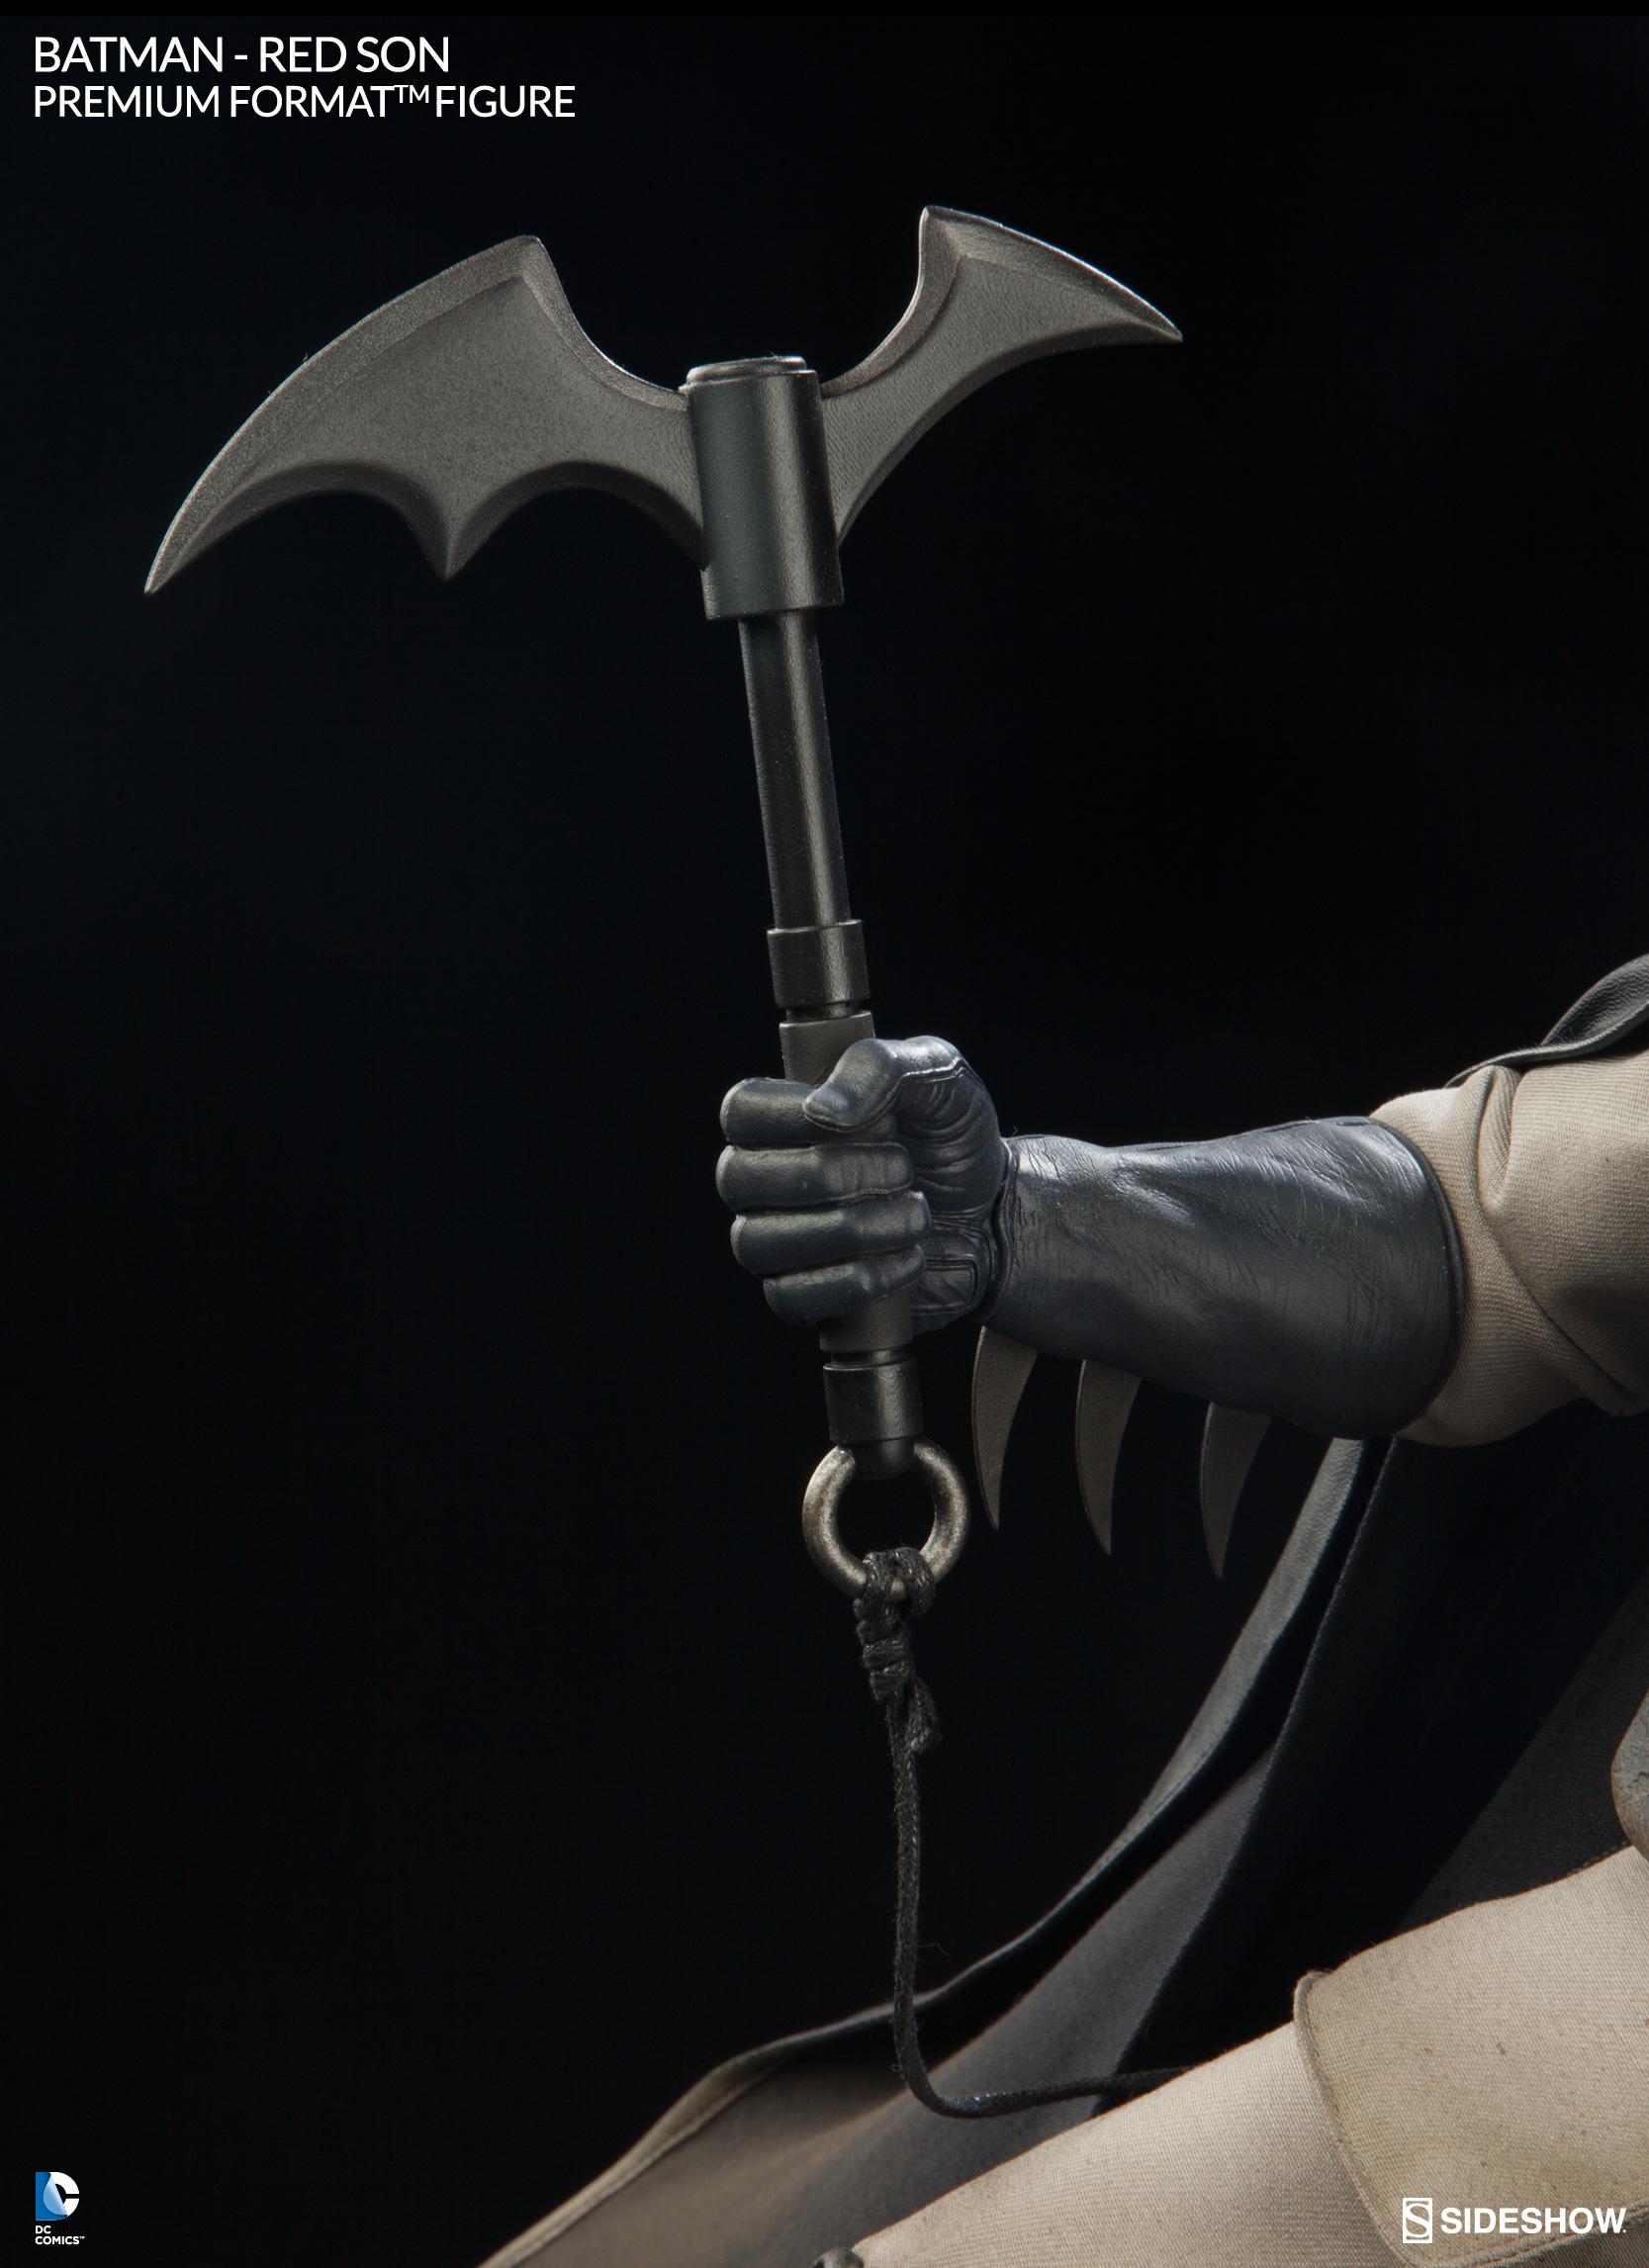 Batman Red Son Premium Format Figure